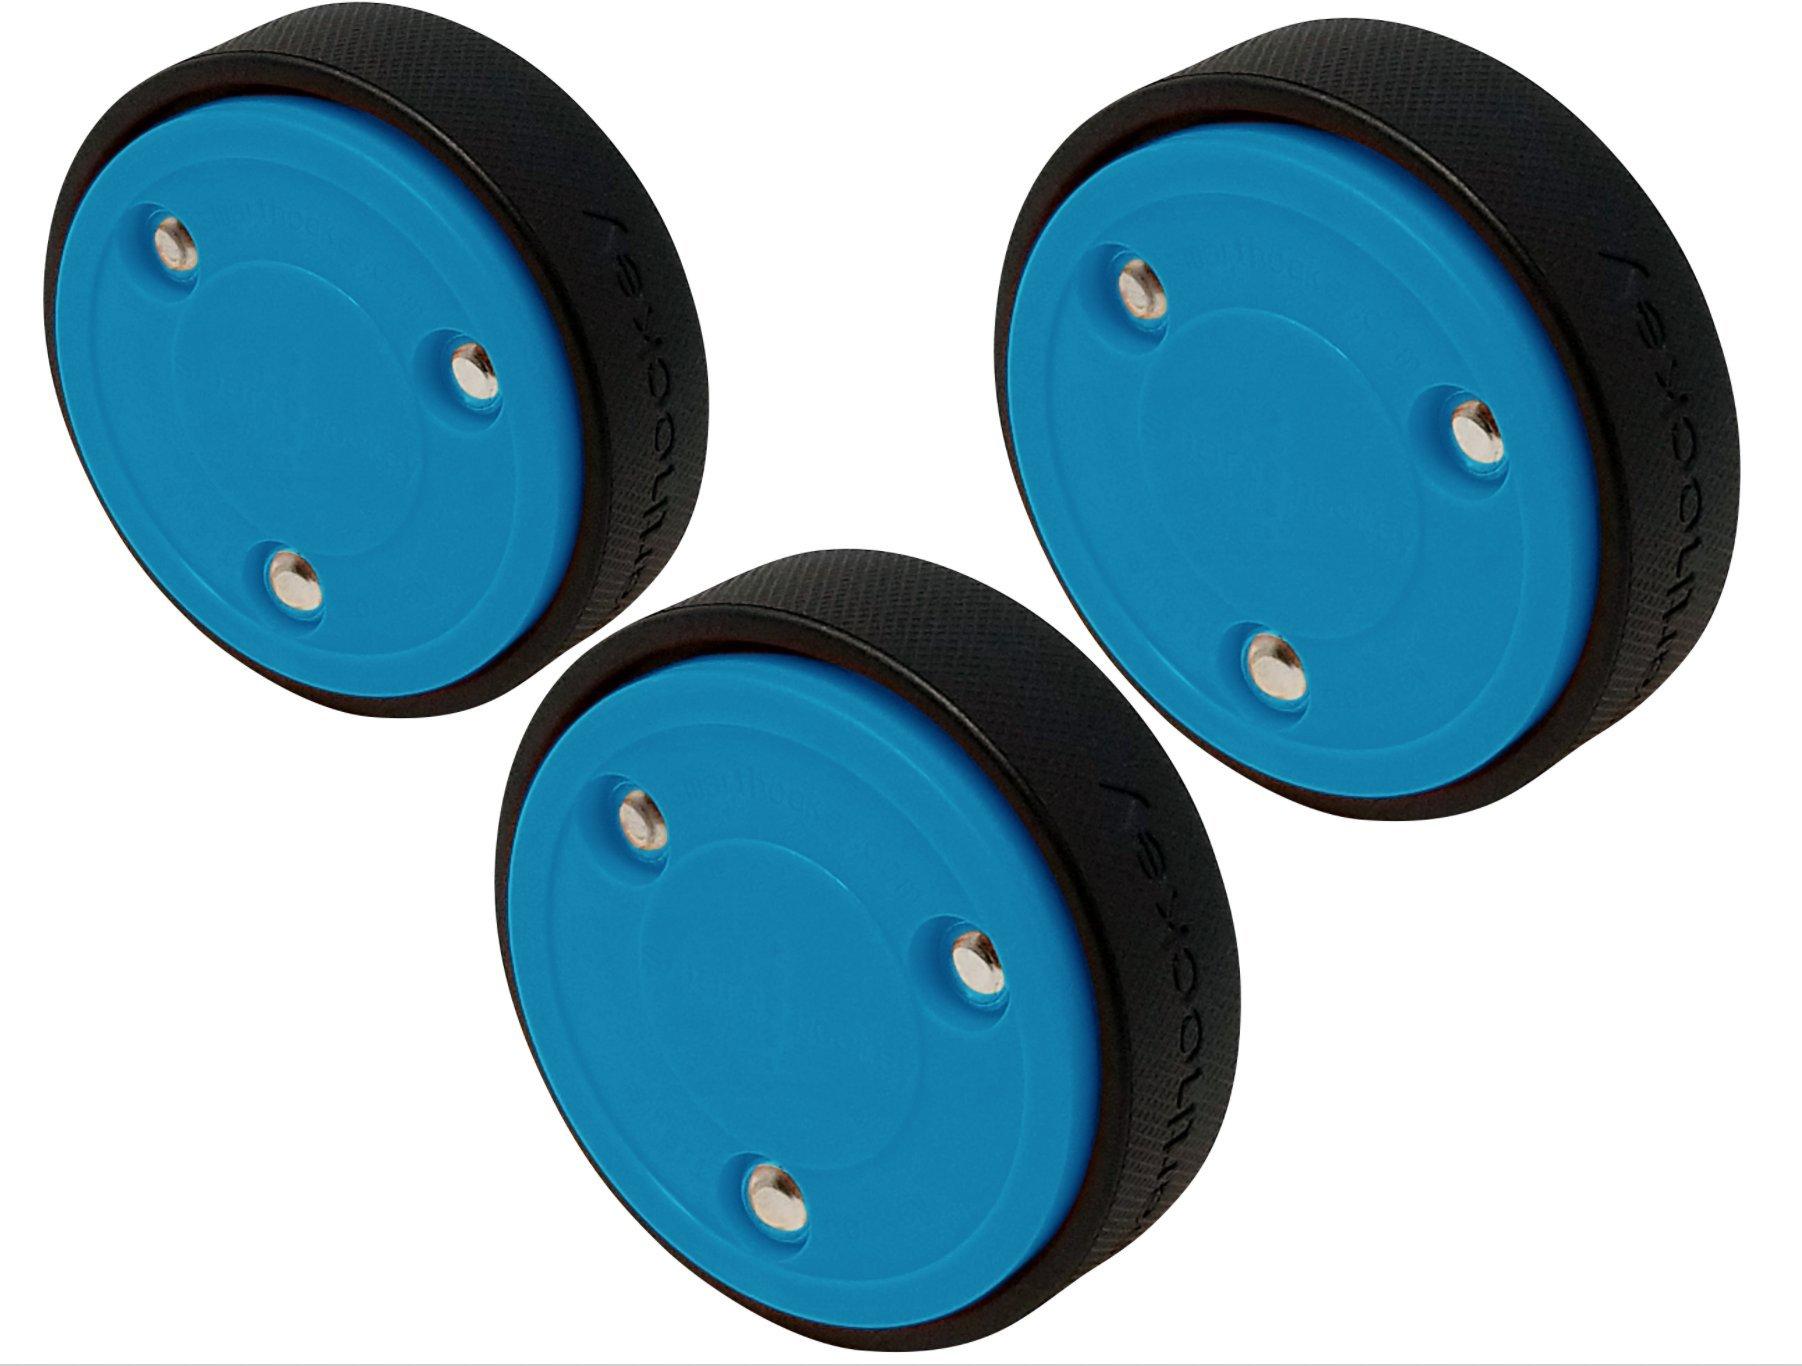 Smarthockey 4oz Slider Hockey Training Speed Puck - BLUE 3-PACK